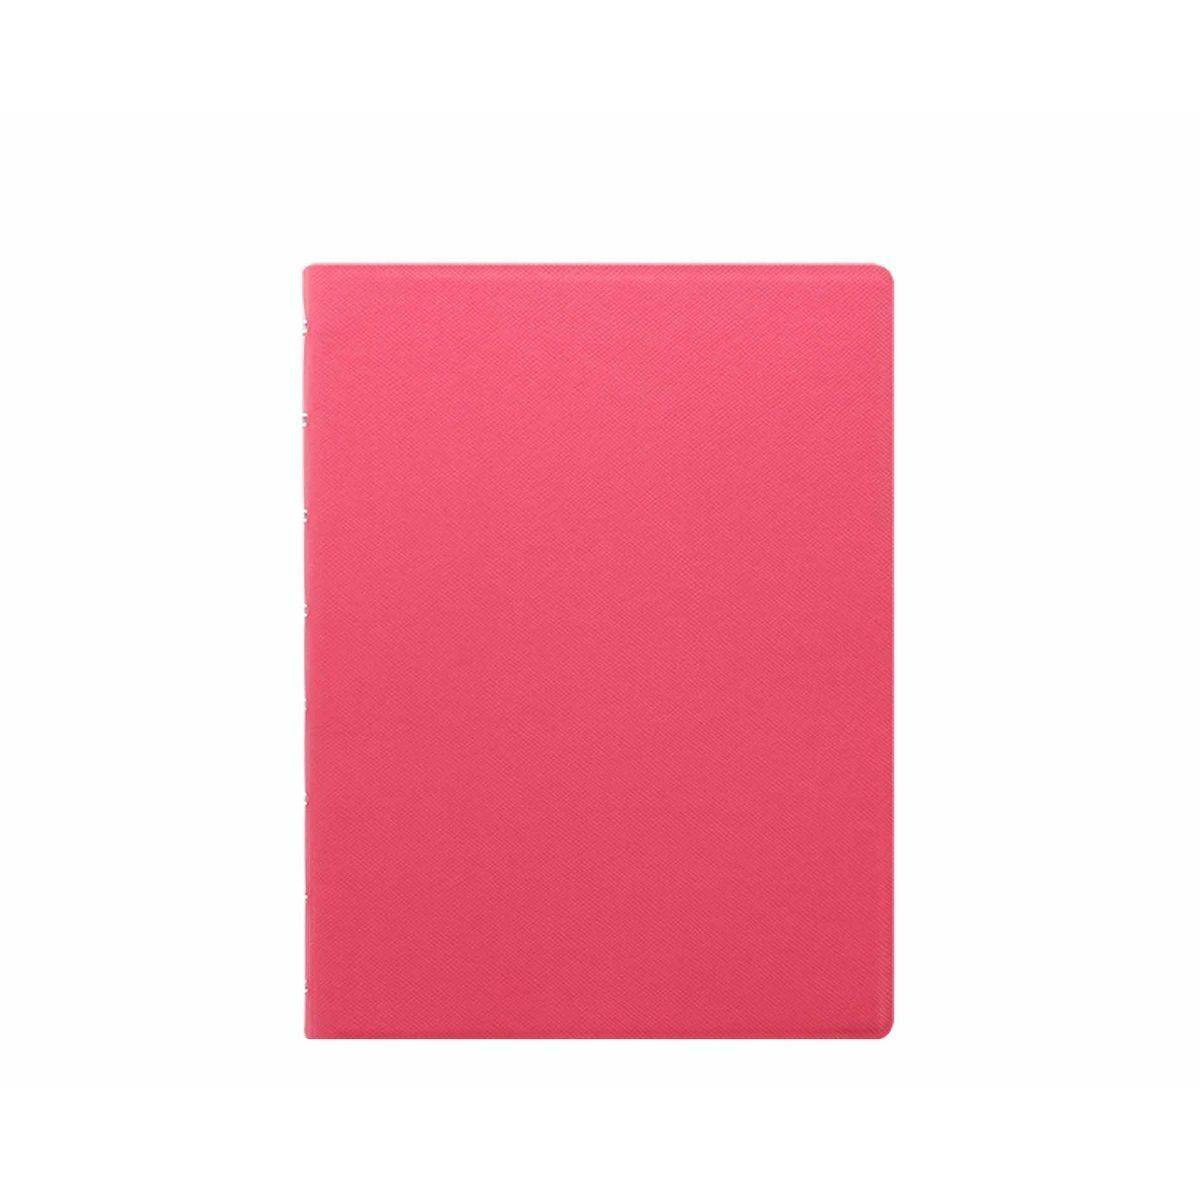 Filofax Refillable Notebook A5 Peony